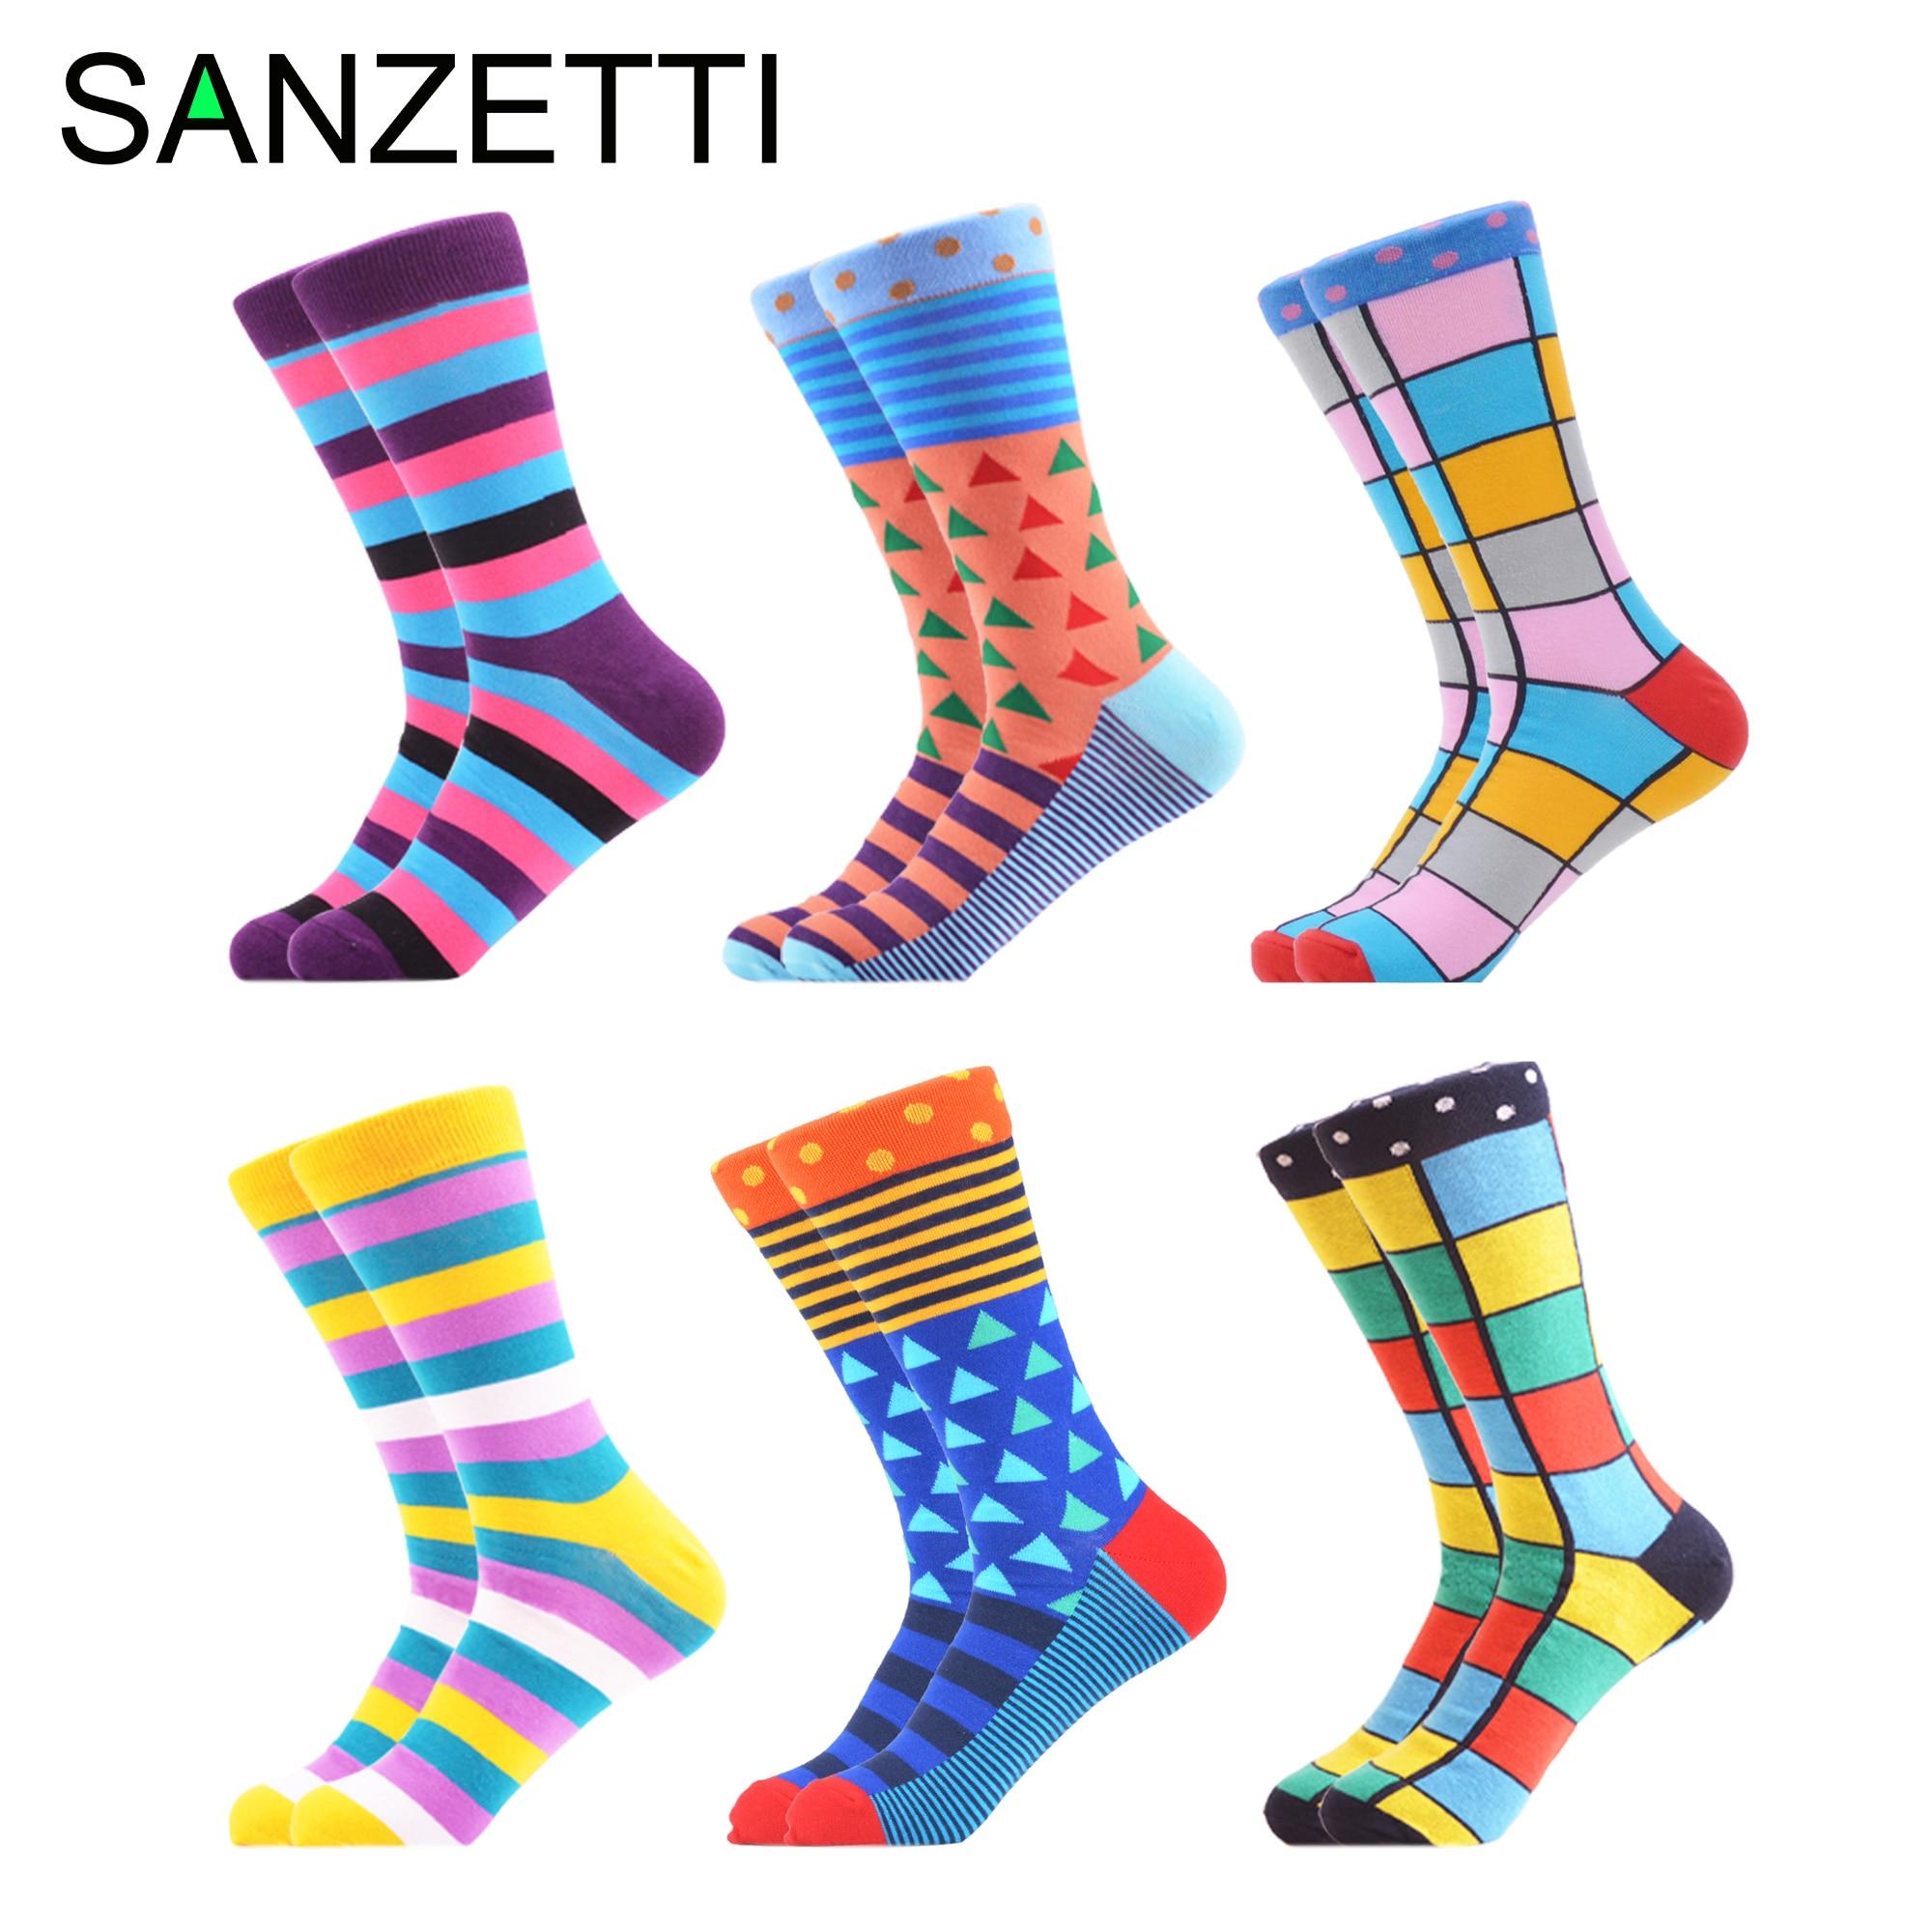 SANZETTI 6 Pairs/Lot Men's Hot Sale Casual Combed Cotton Socks Striped Soft Worn Dress Comfortable Wedding Gift Creative Socks